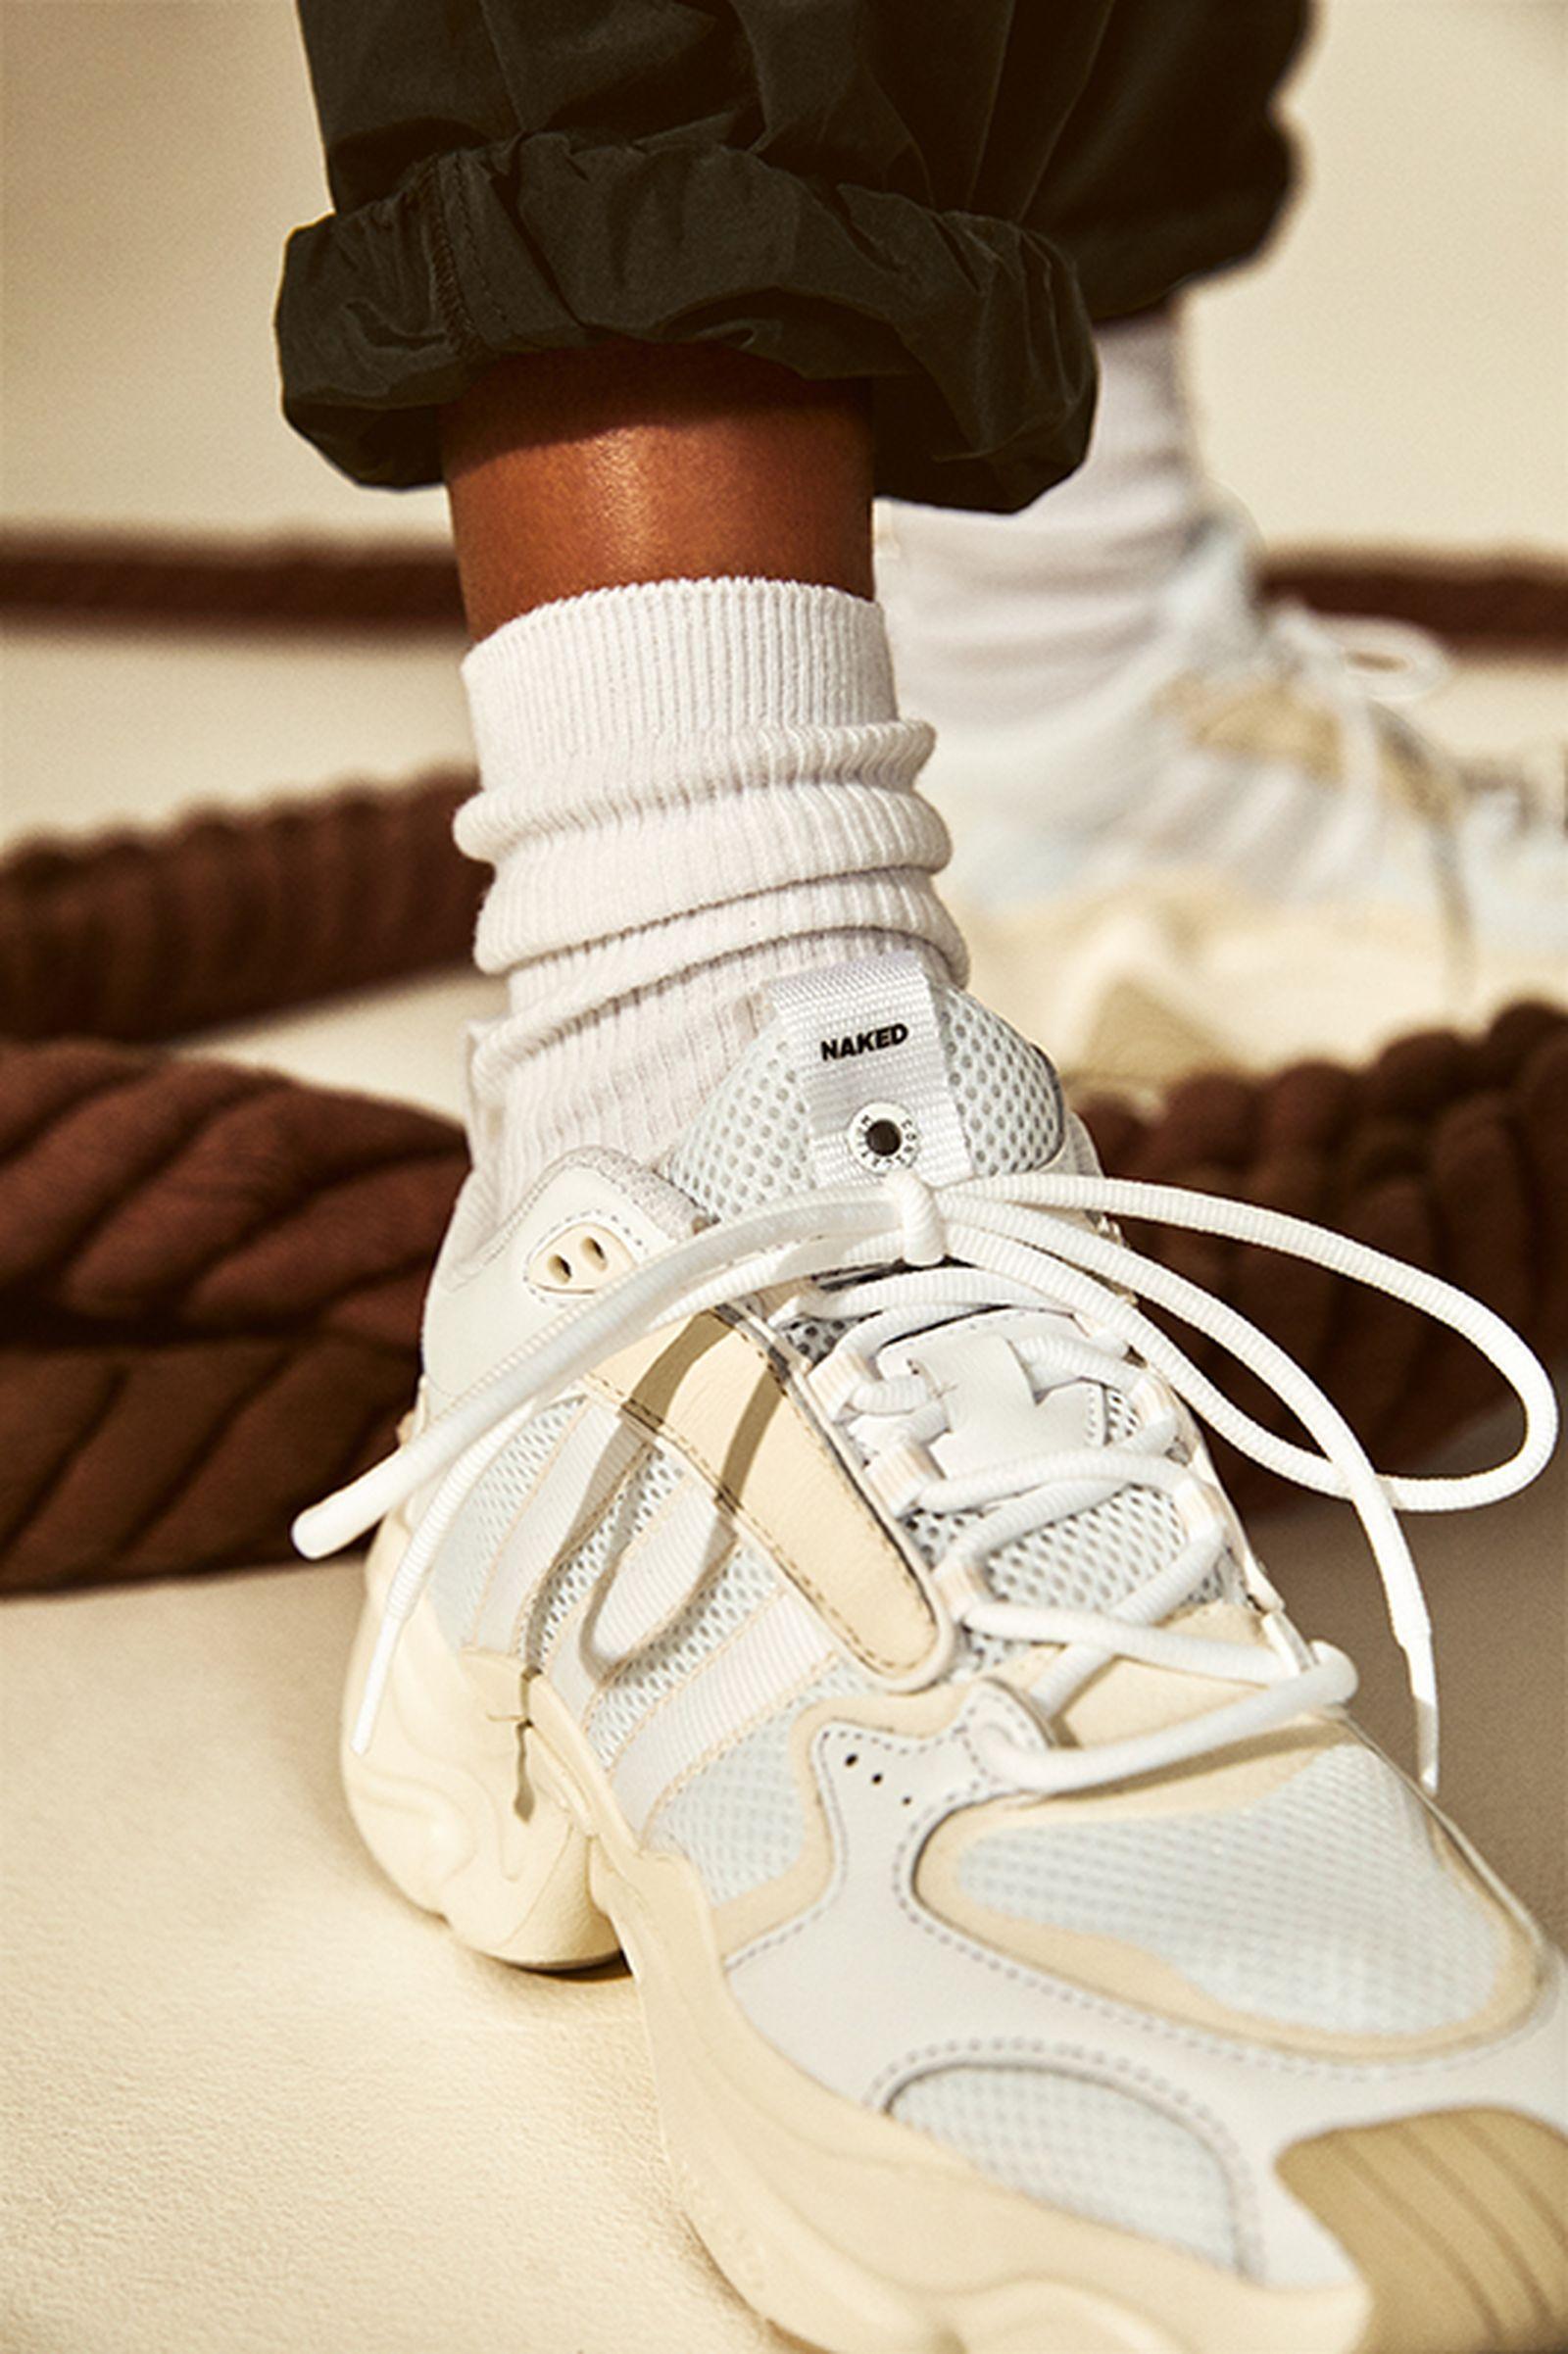 naked adidas magmur runner release date price 2 adidas consortium